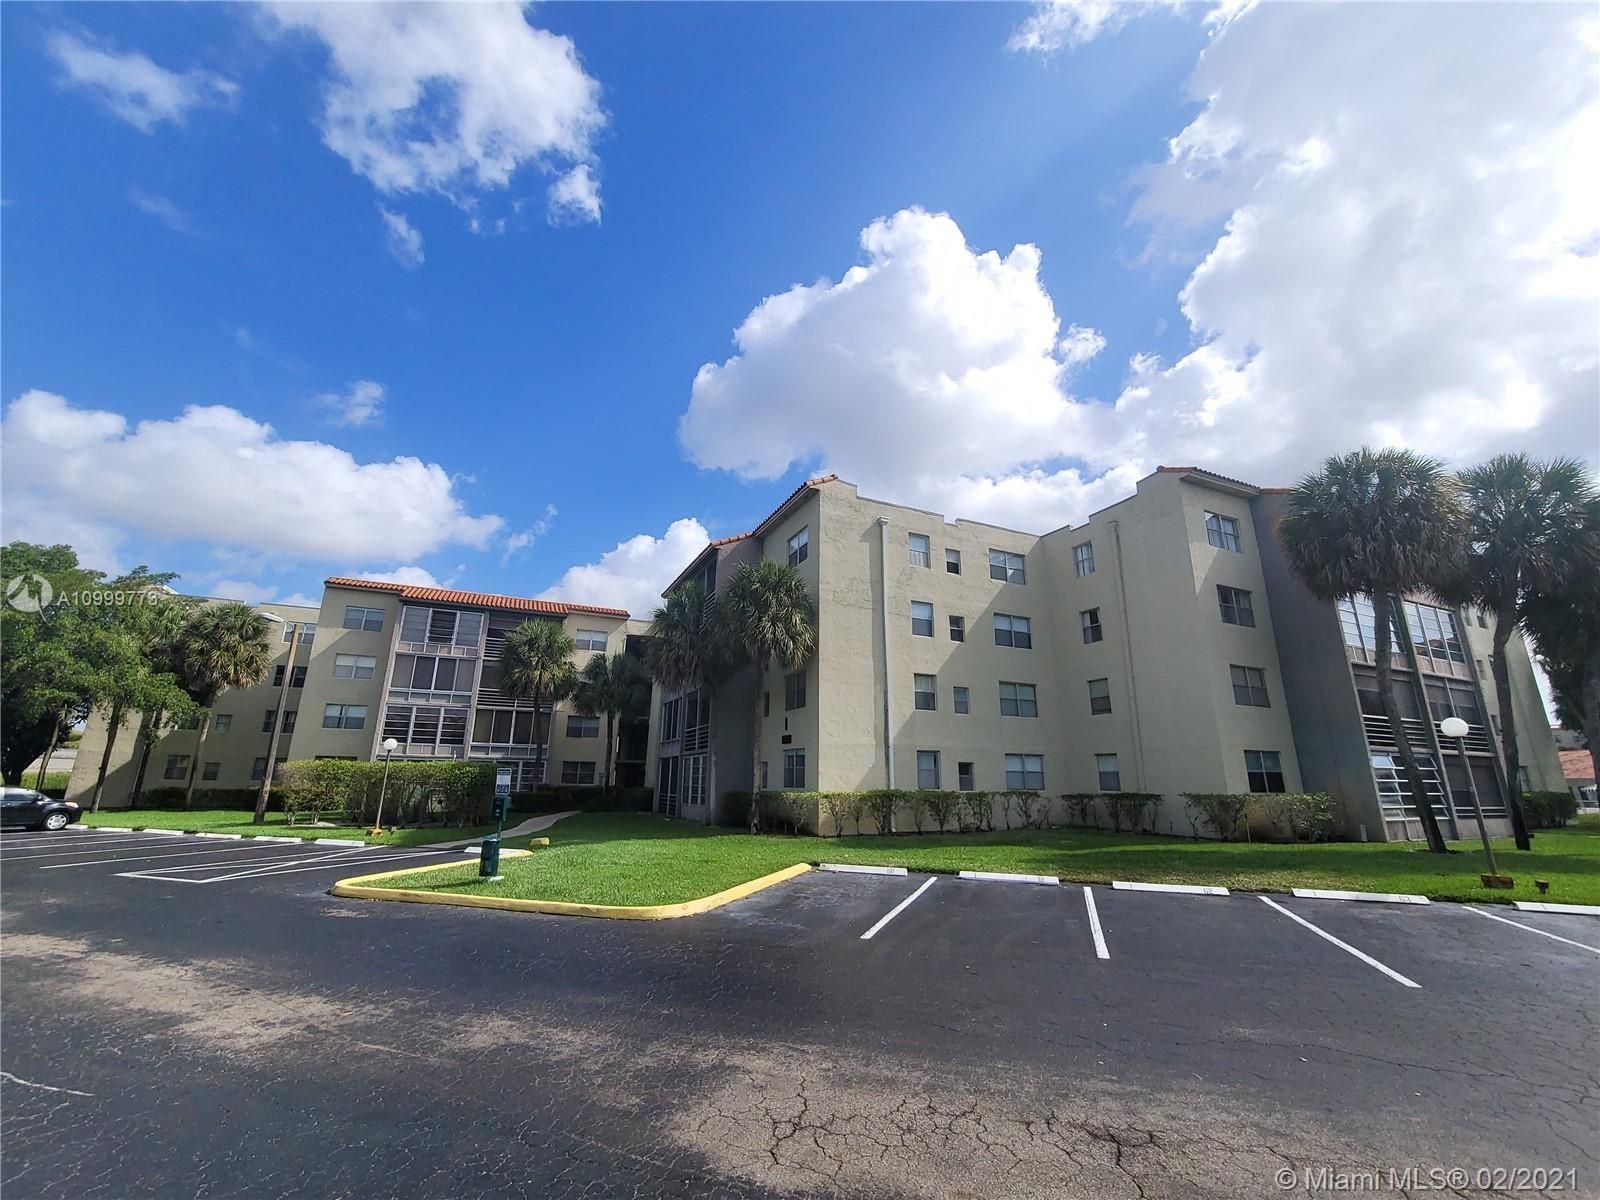 1800 N Lauderdale Ave #1116, North Lauderdale, FL 33068 - #: A10999773